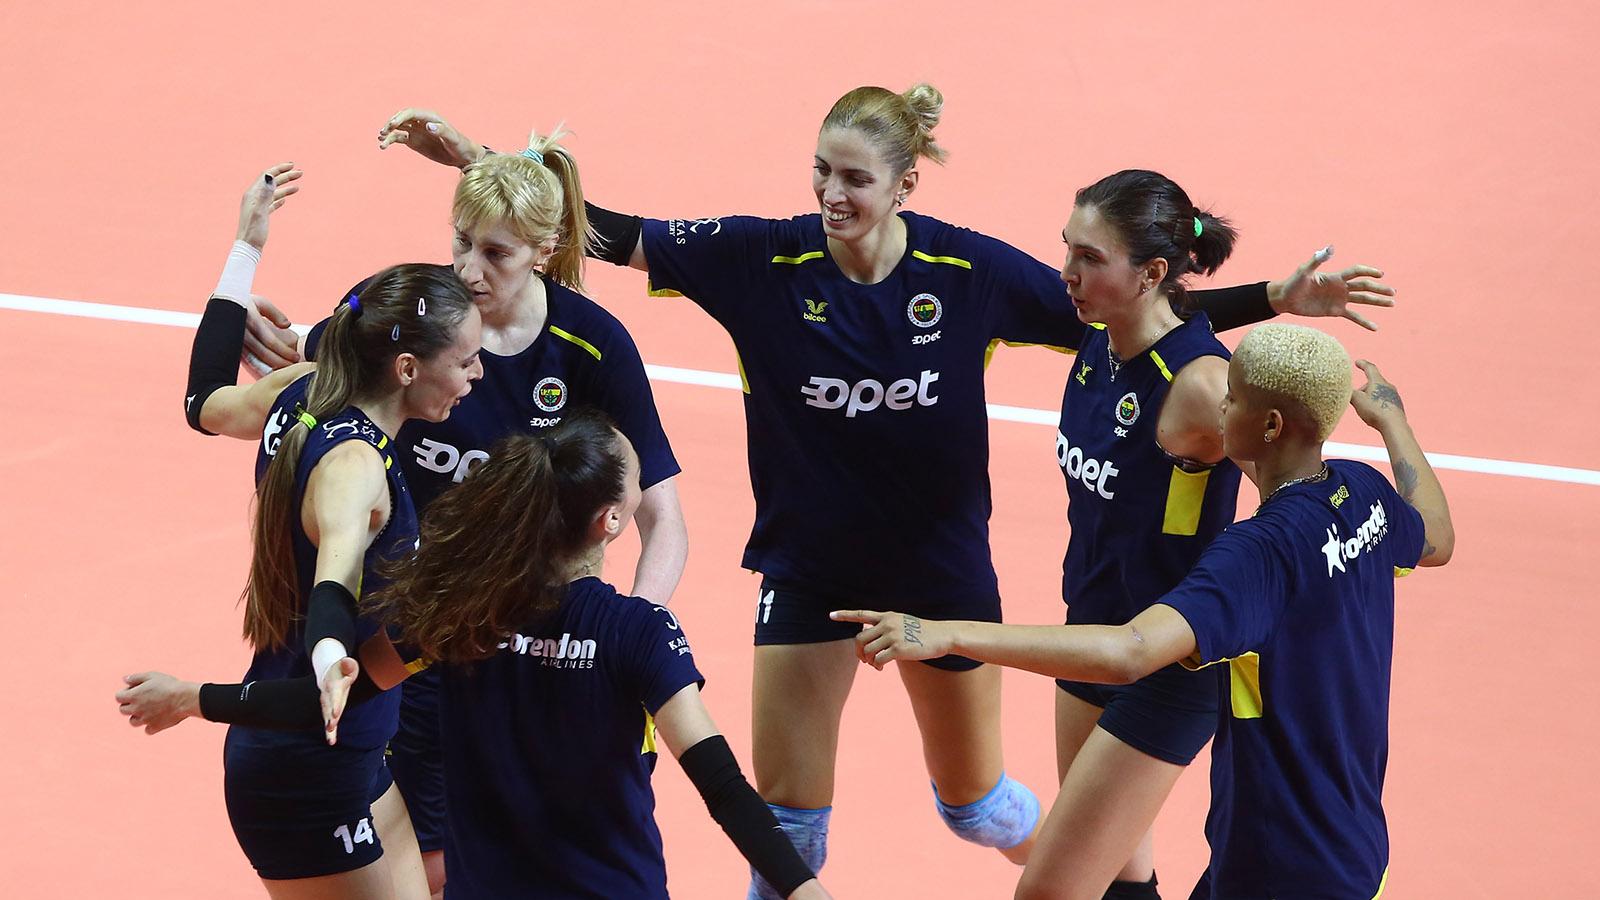 Fenerbahçe Opet 2-2 PTT (Hazırlık maçı)